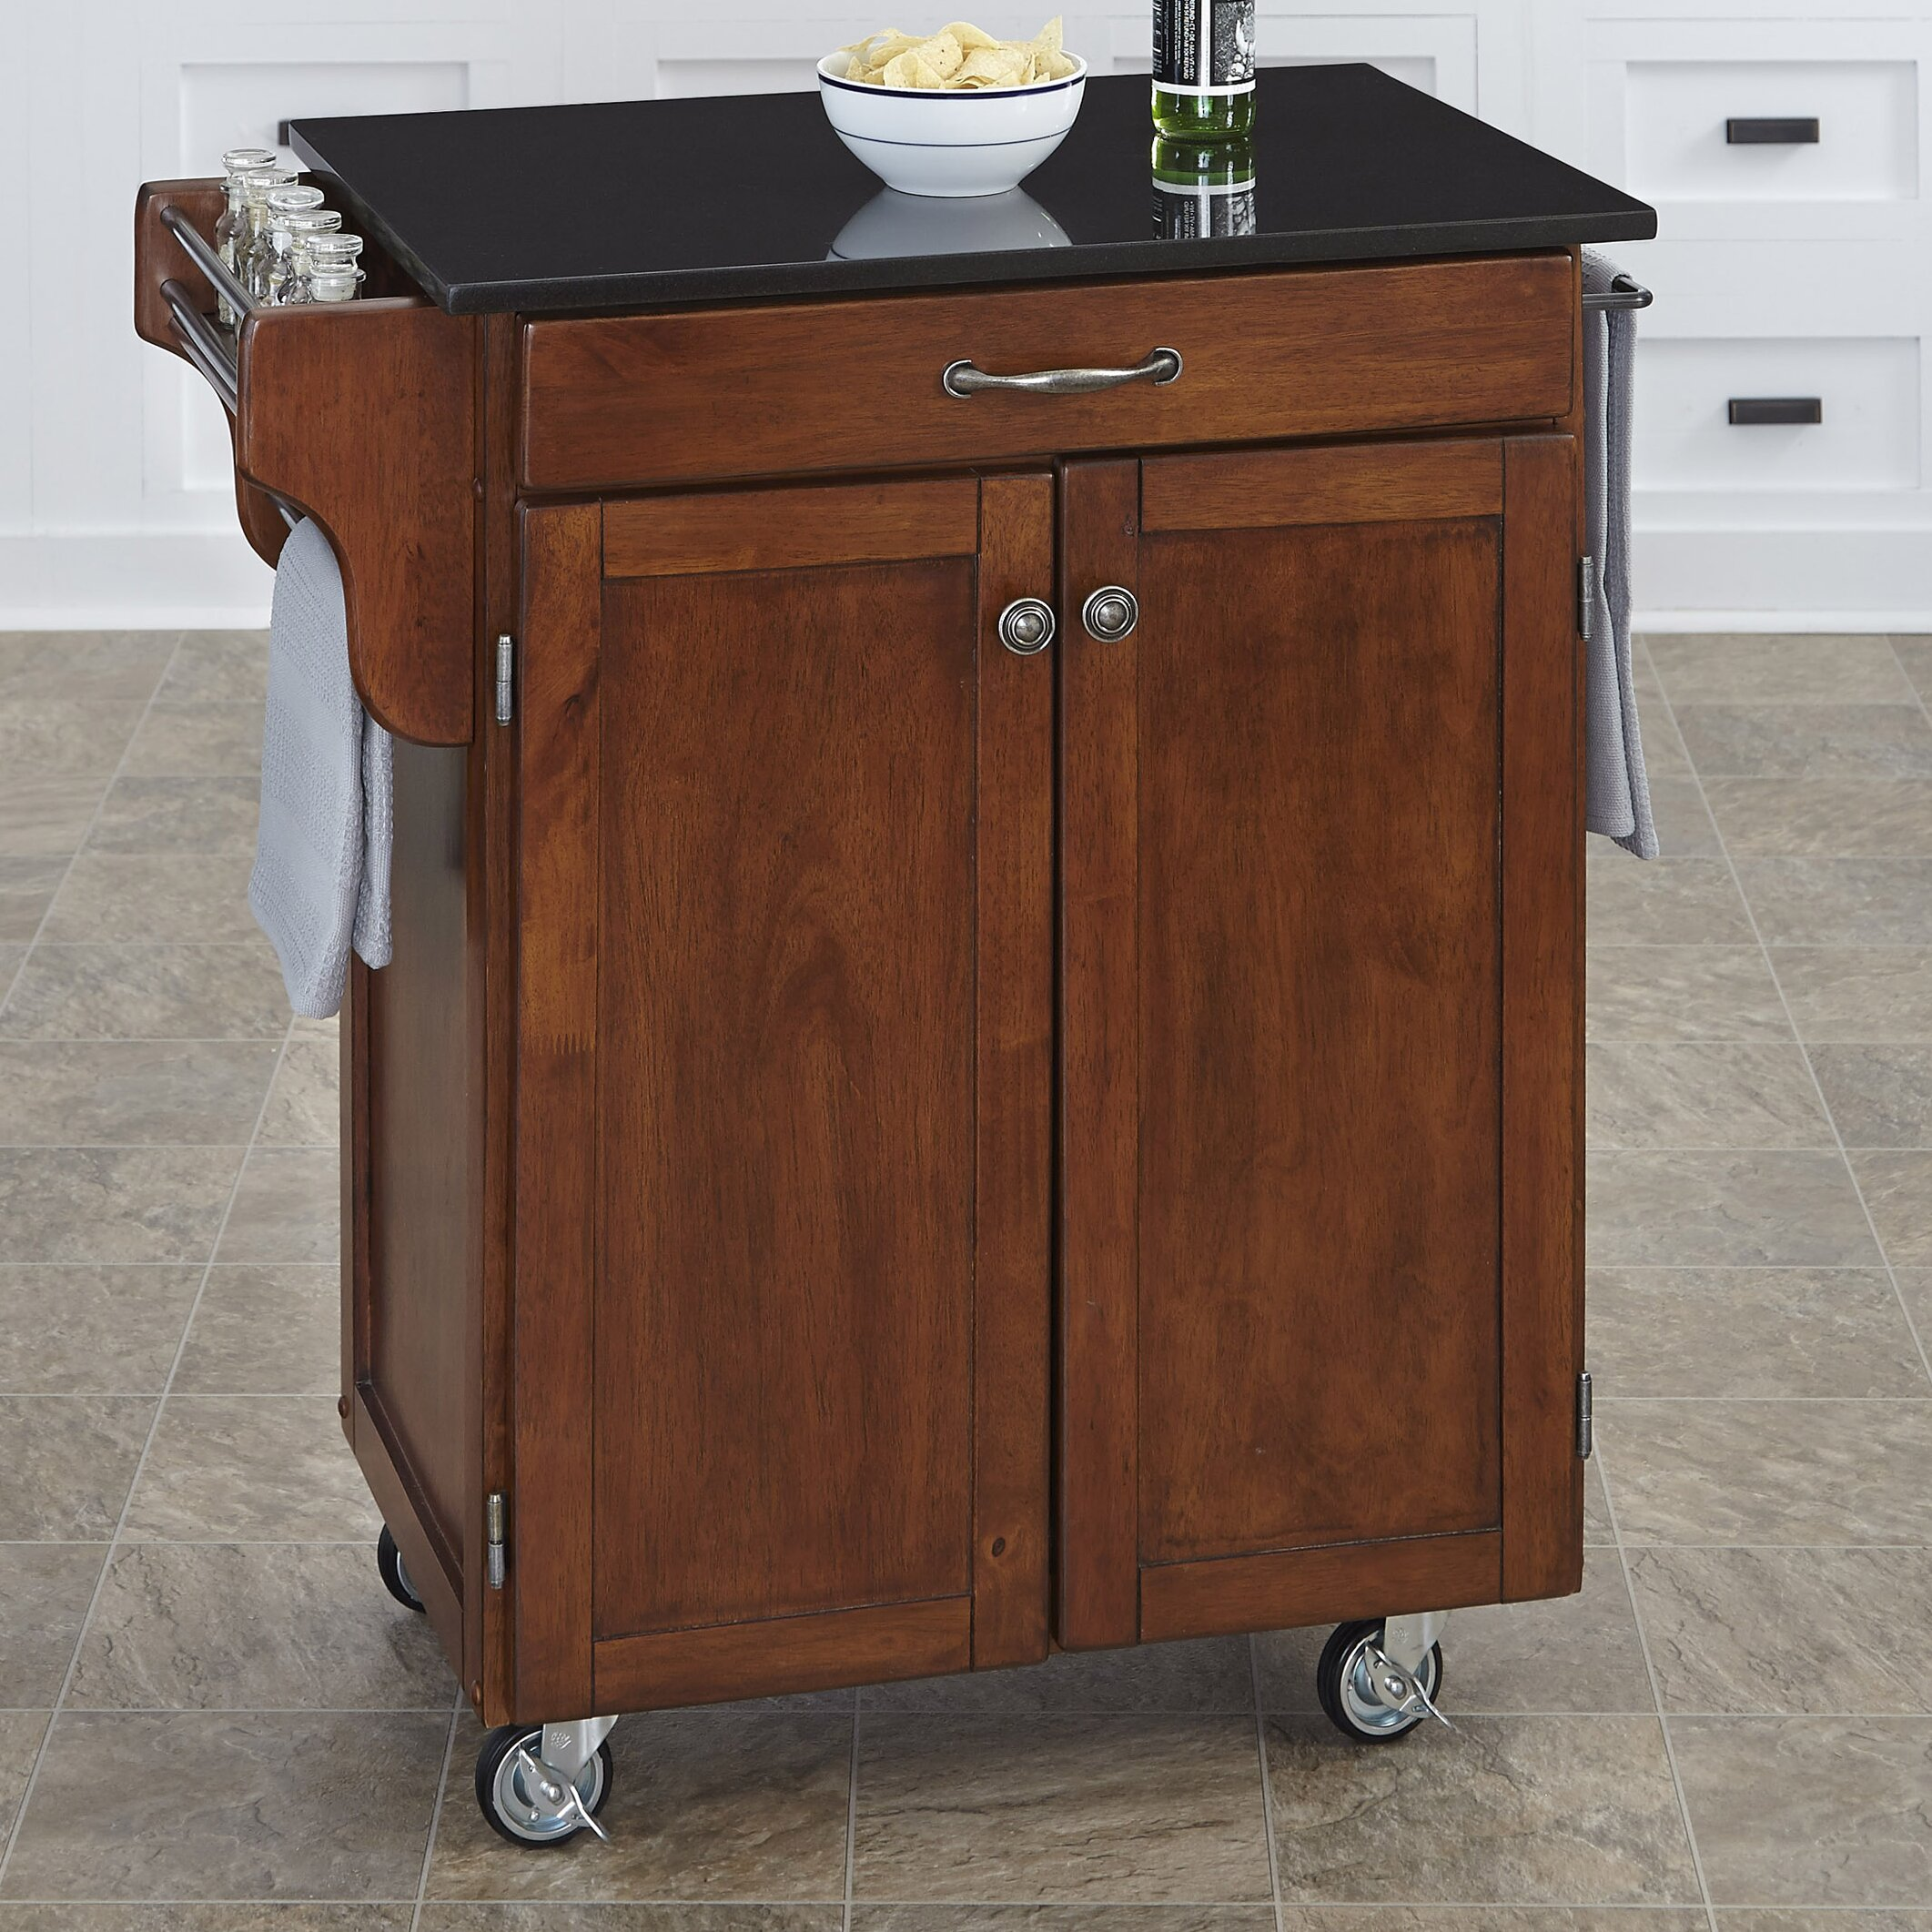 august grove savorey granite top kitchen cart reviews. Black Bedroom Furniture Sets. Home Design Ideas